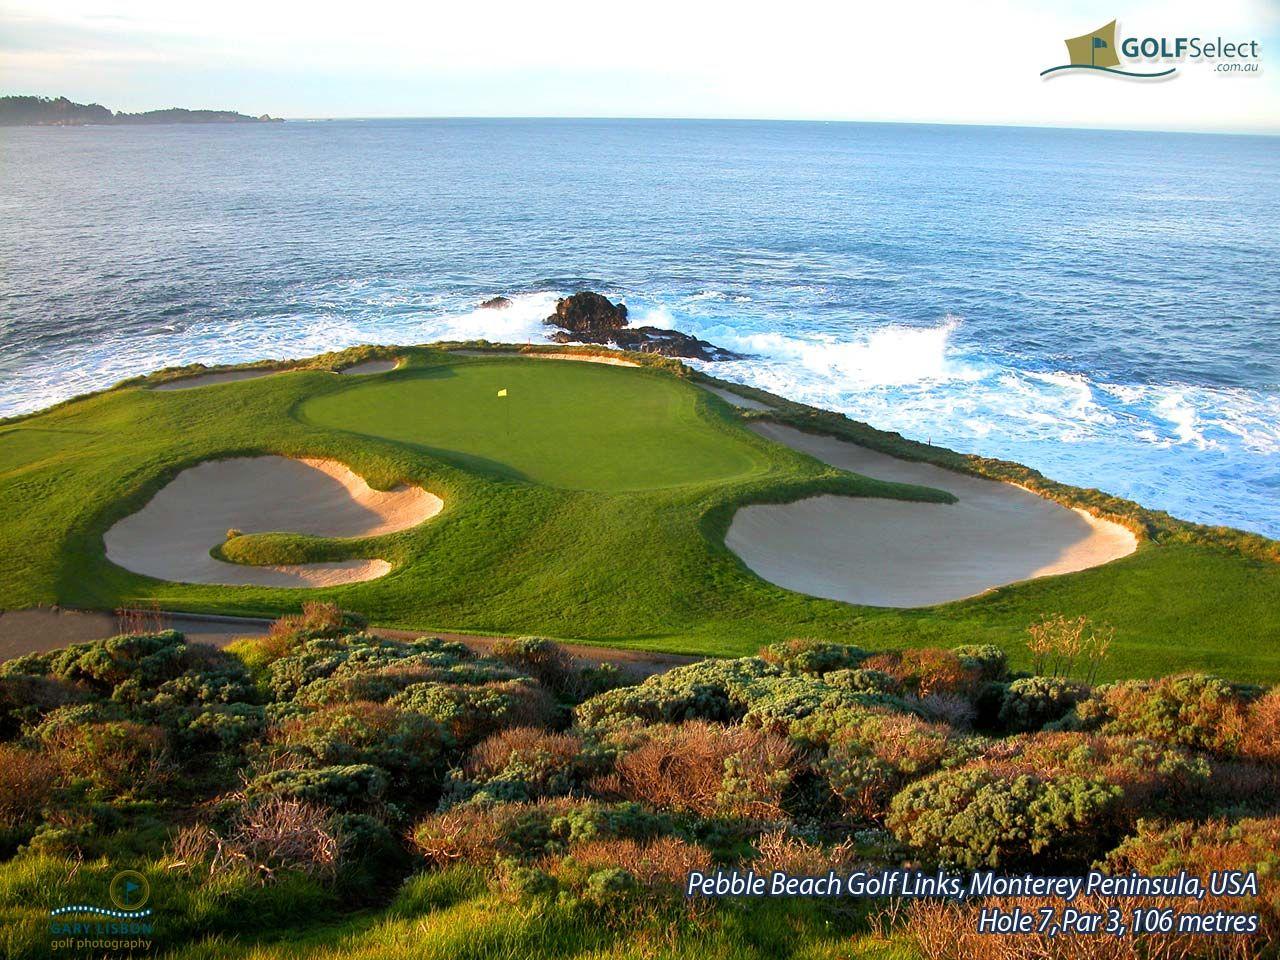 Golf Theme Wallpaper 1440 900 Golf Course Backgrounds 51 Wallpapers Adorable Wallpapers Golf Courses Public Golf Courses Pebble Beach